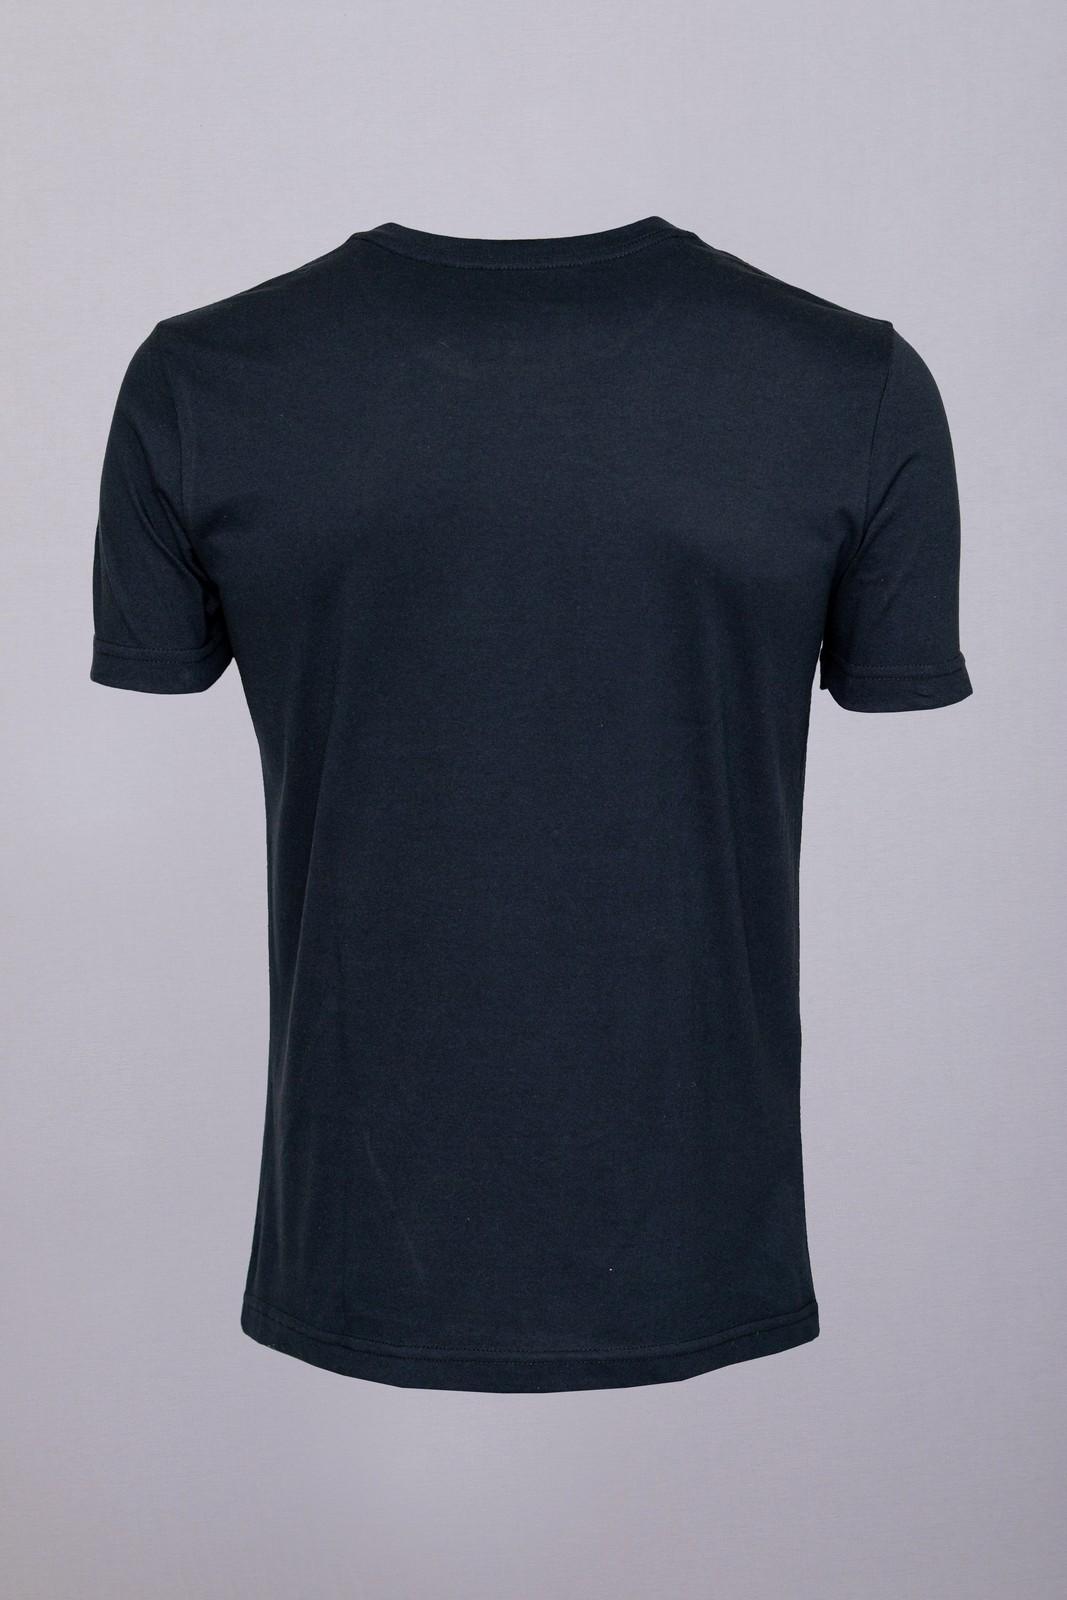 Camiseta CoolWave Games Lines Preta